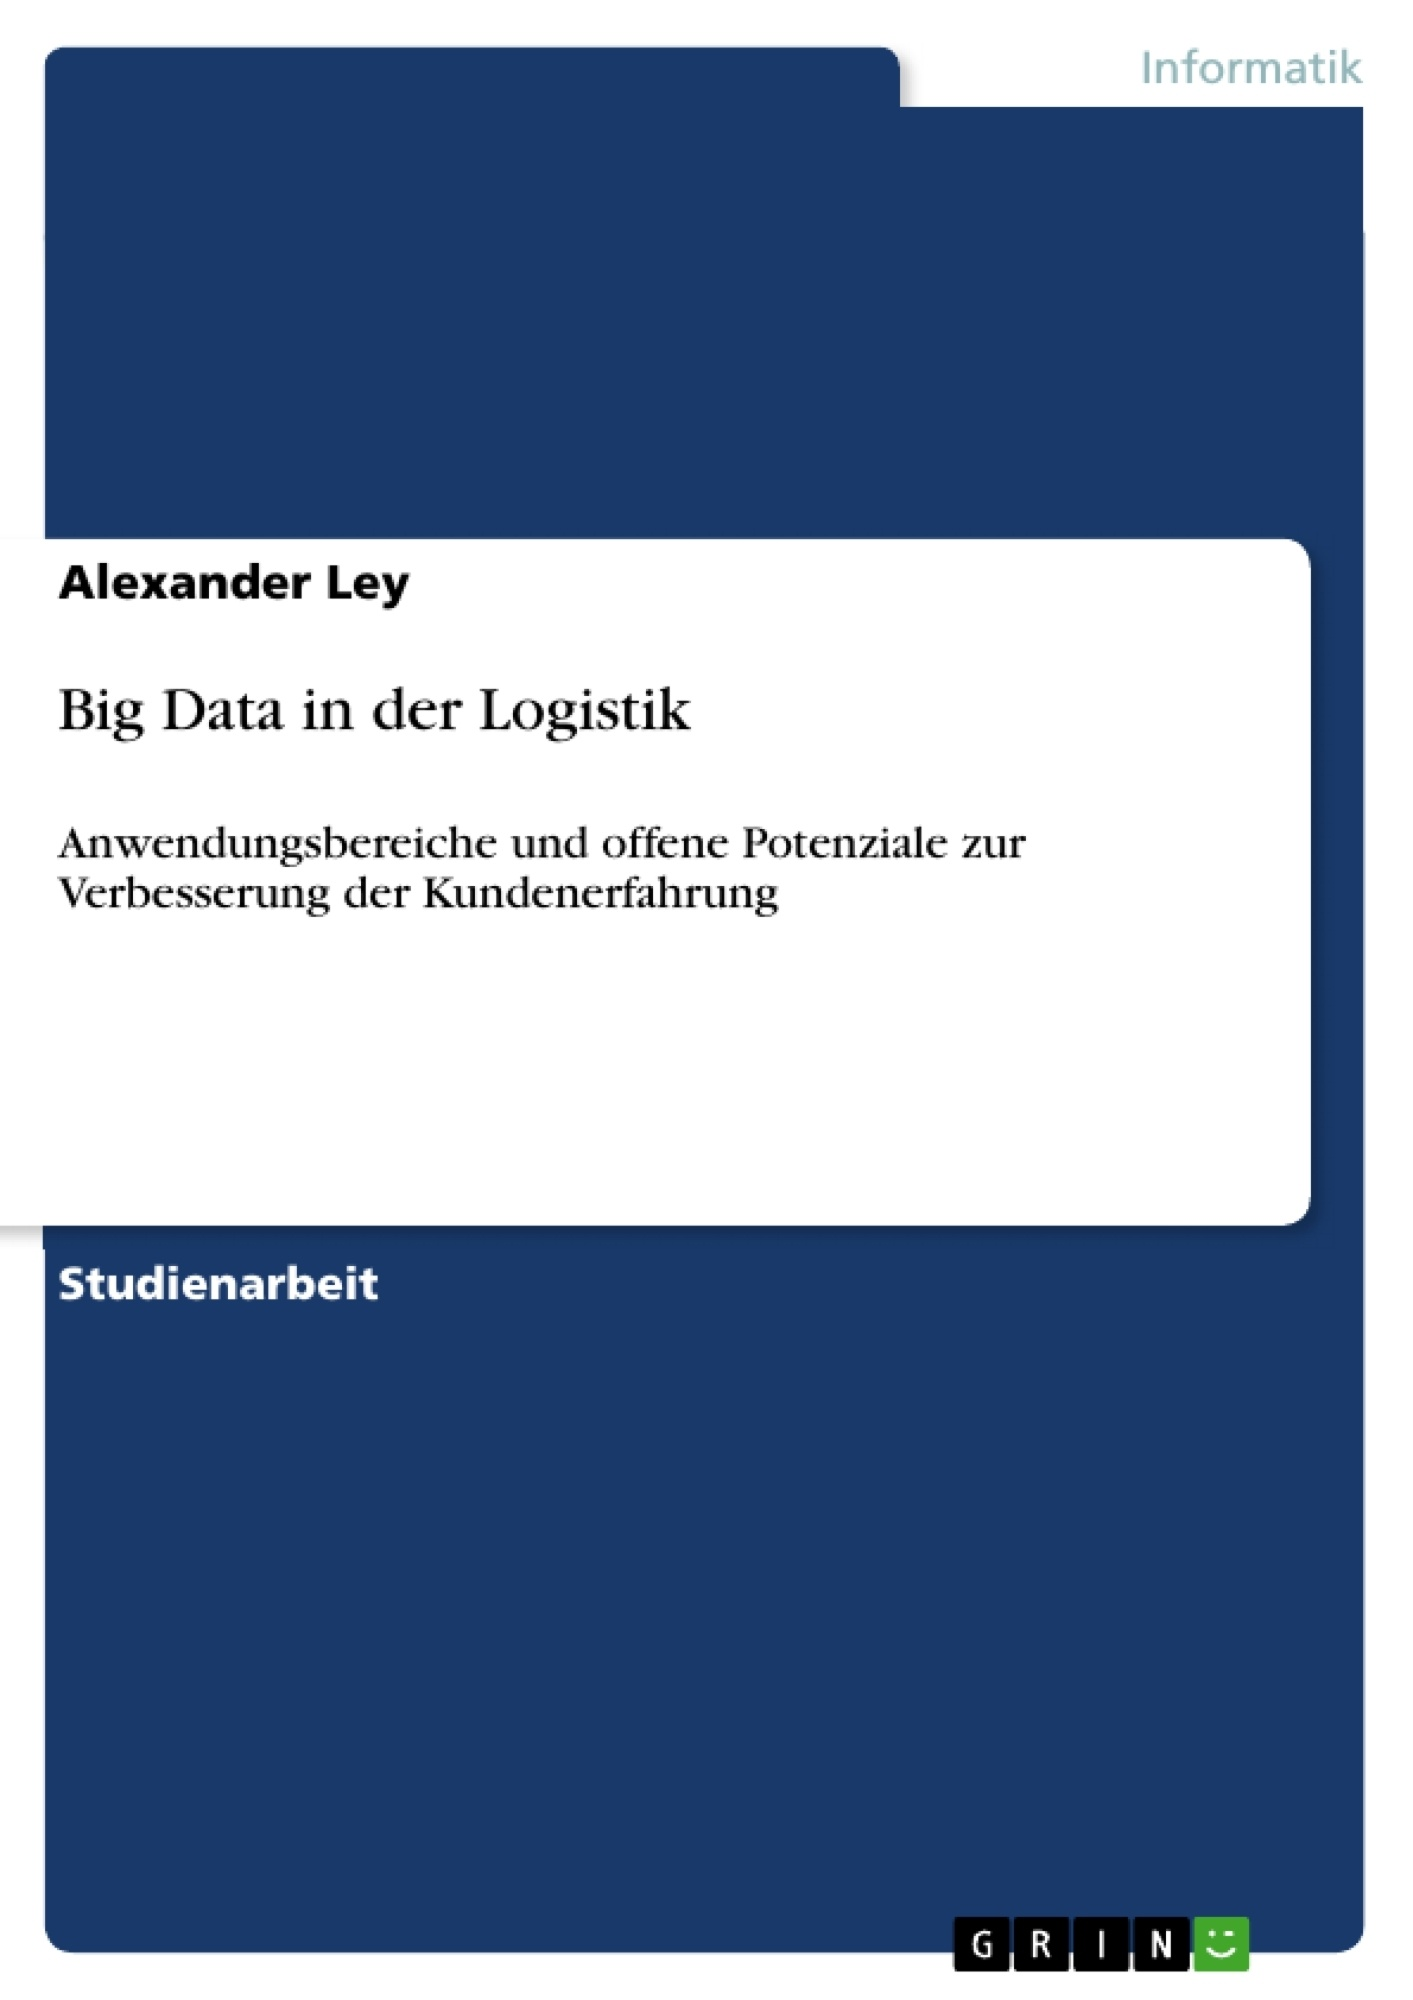 Titel: Big Data in der Logistik